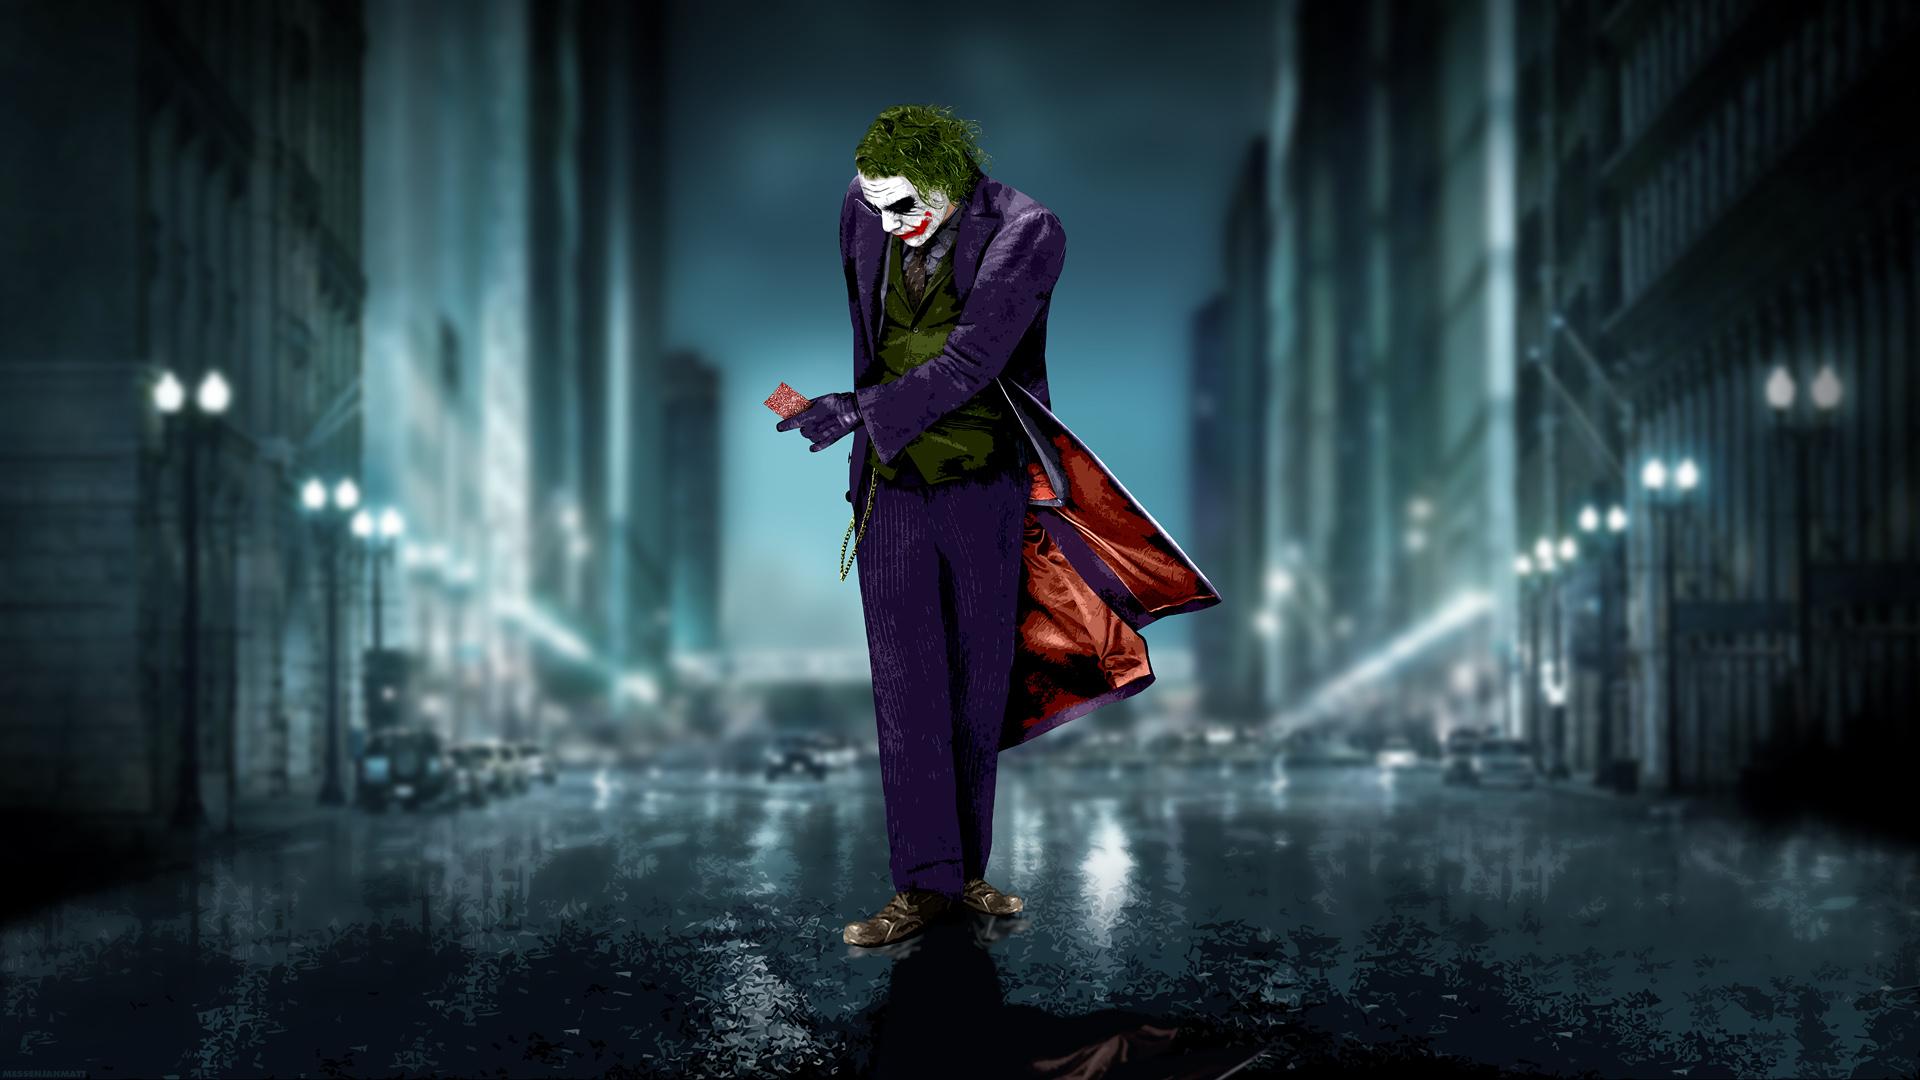 Hemos elegido este buen fondo de Joker para que cambies tu viejo fondo 1920x1080